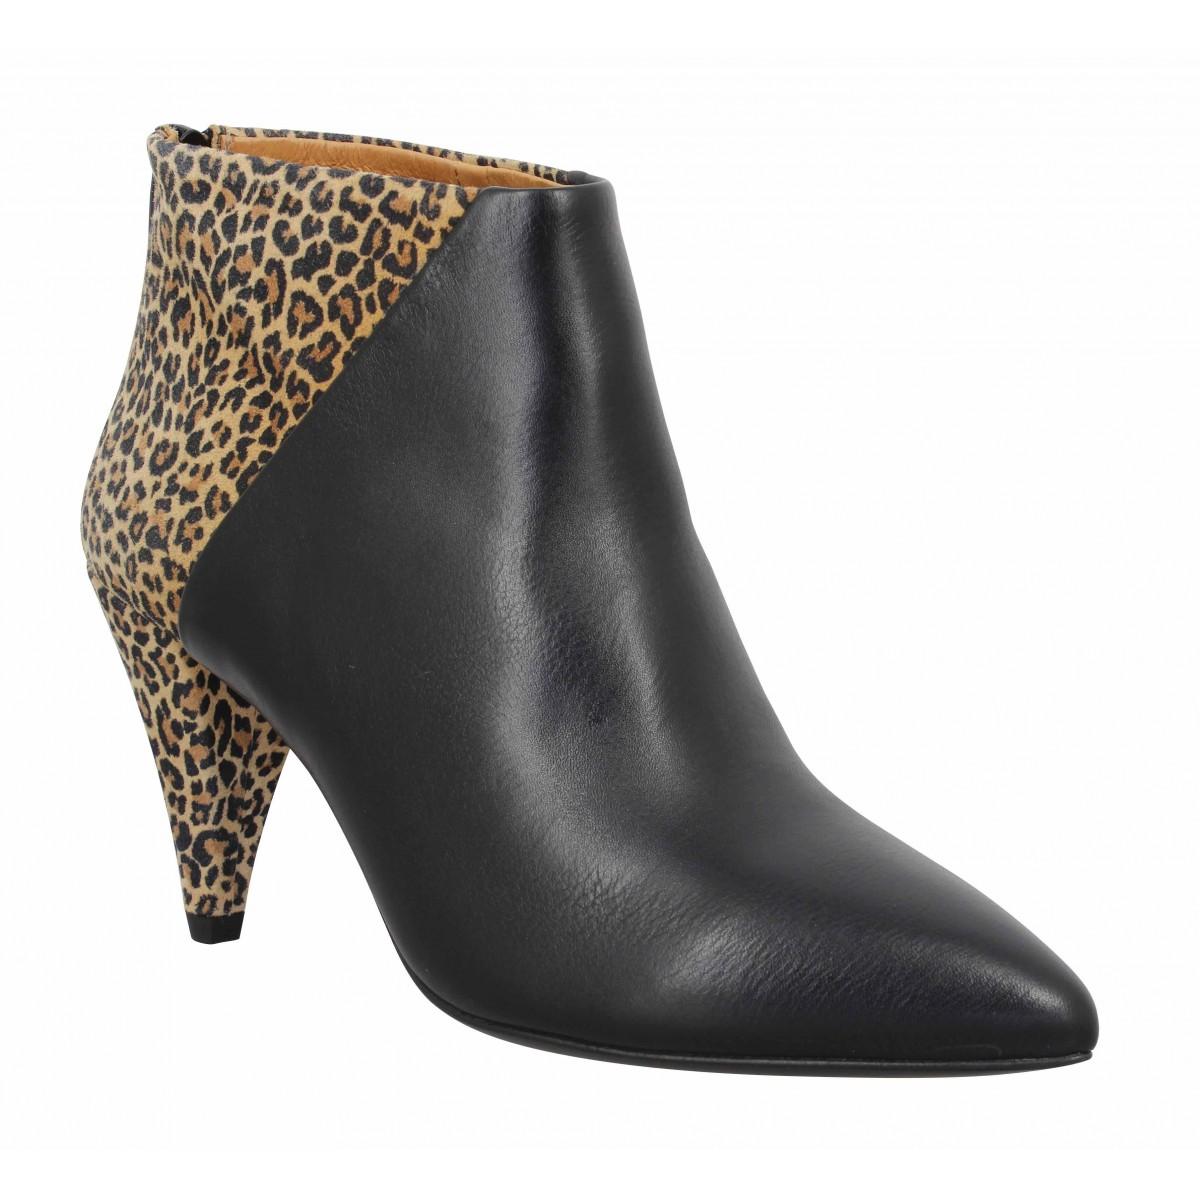 Bottines KMASSALIA Alice cuir Femme Noir Leopard